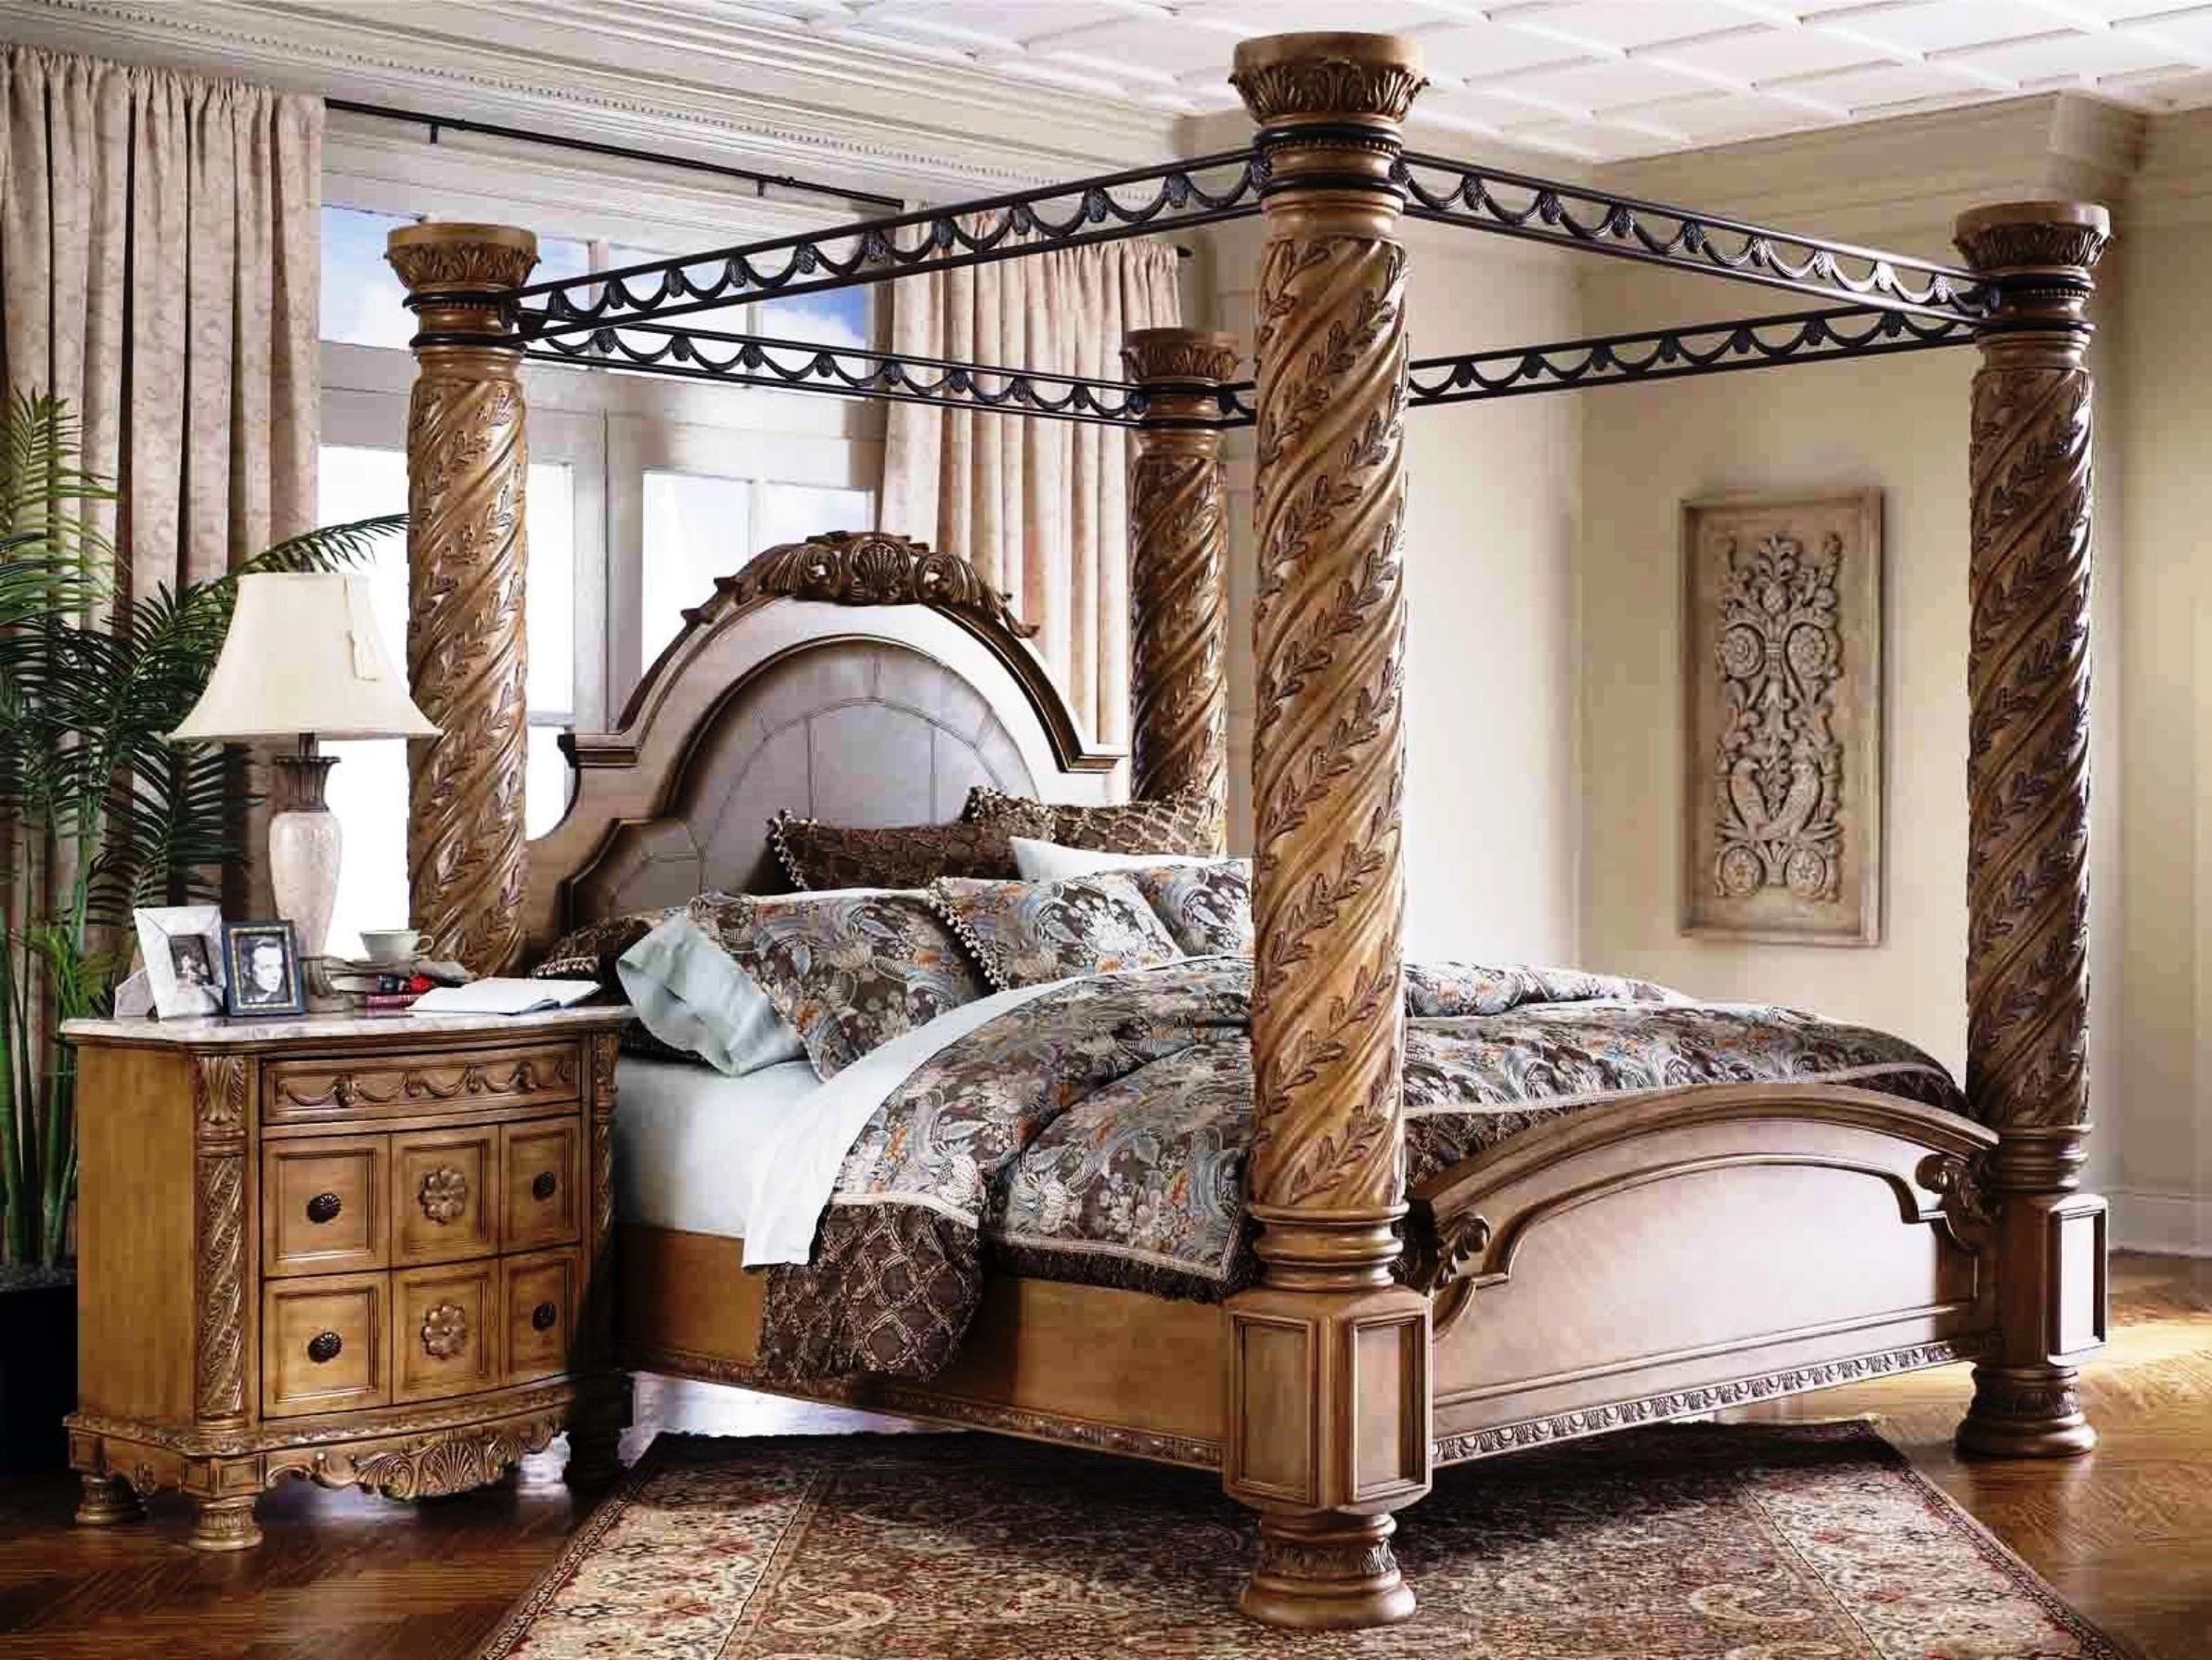 13 Amazing Ways How to Improve Havertys Bedroom Furniture